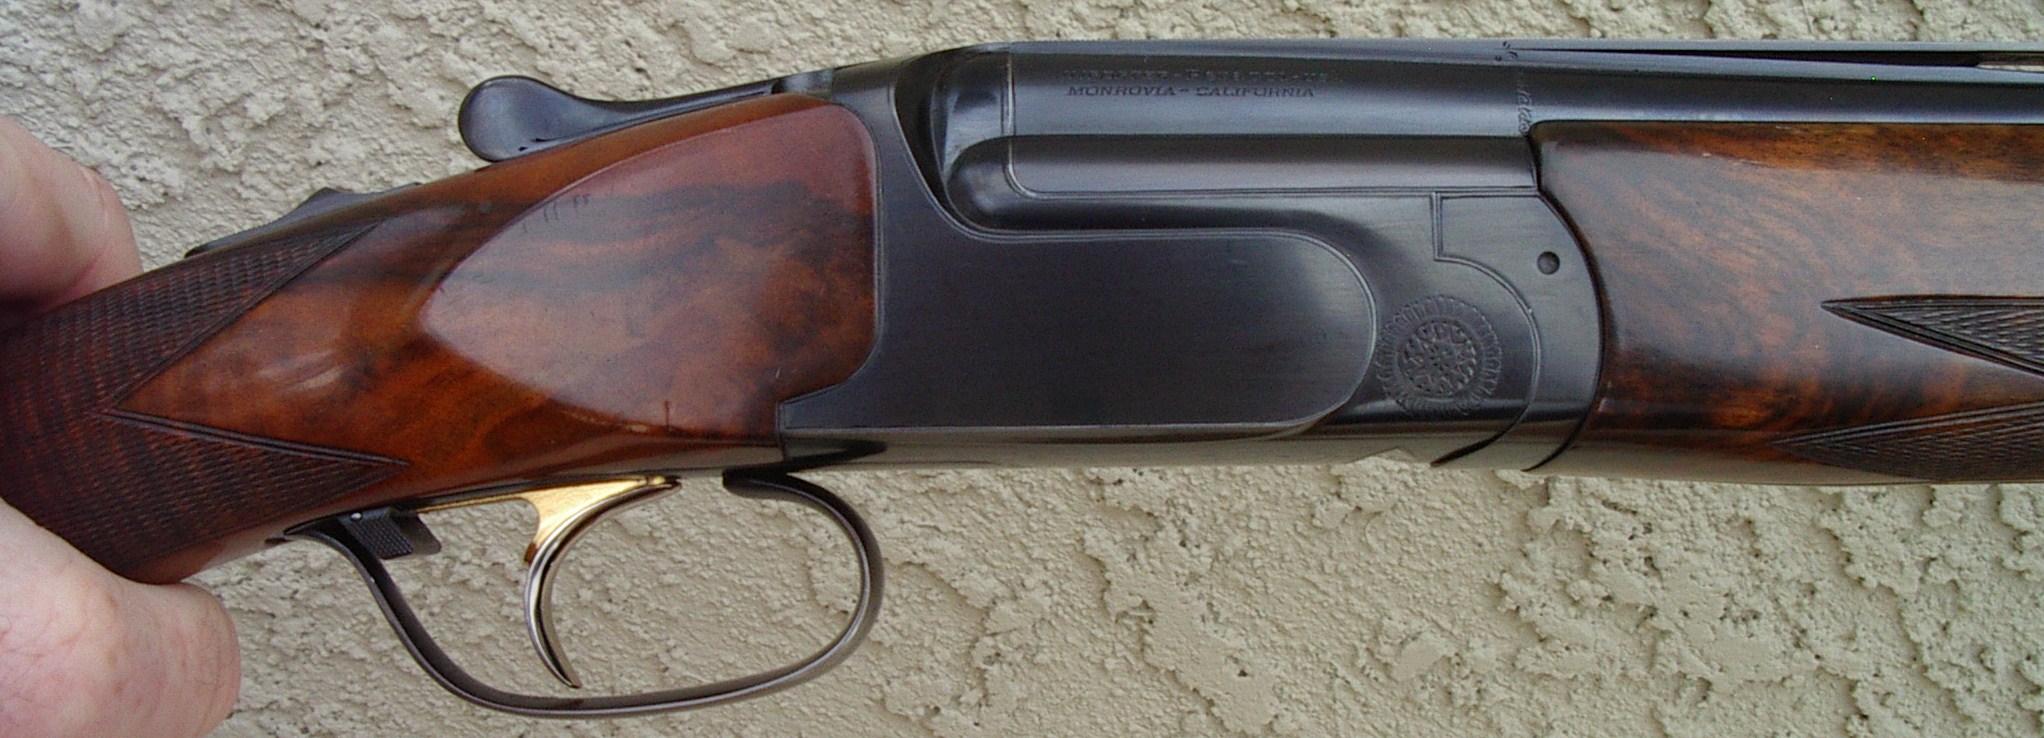 MX8 20 Ext Sel Trigger 005.JPG